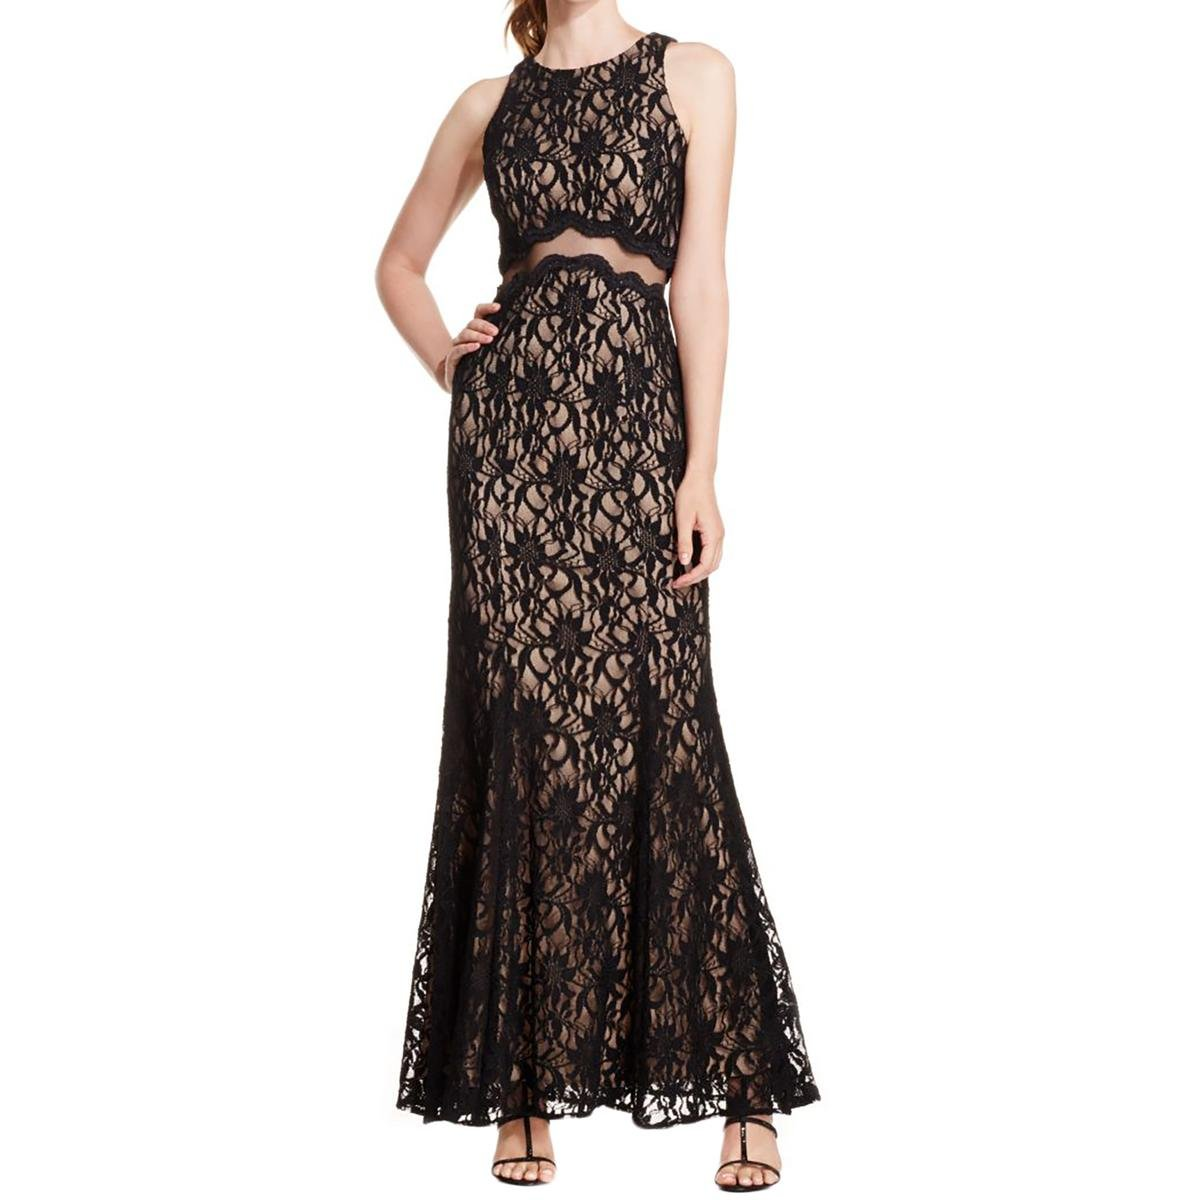 831b62cd5c1 Xscape Women s Illusion-Waist Sleeveless Lace Gown (8